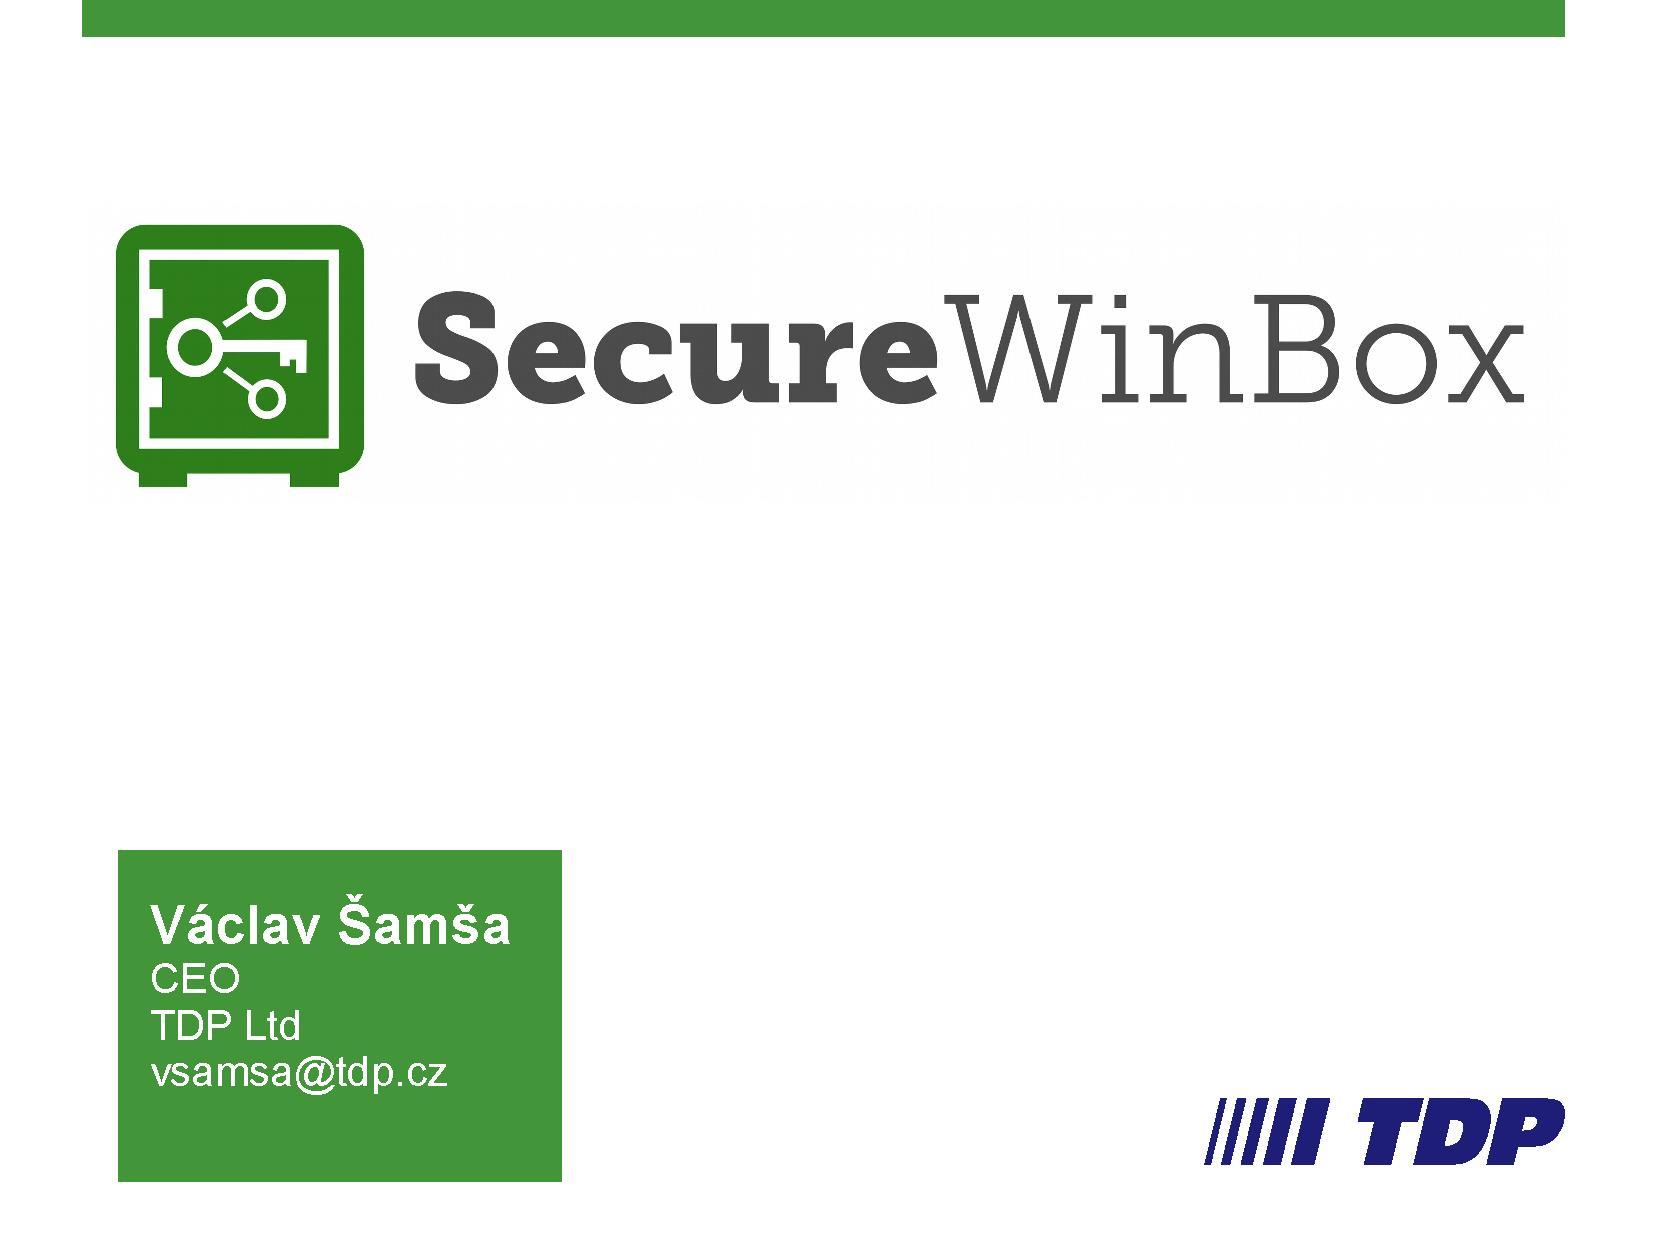 SecureWinBox - overview